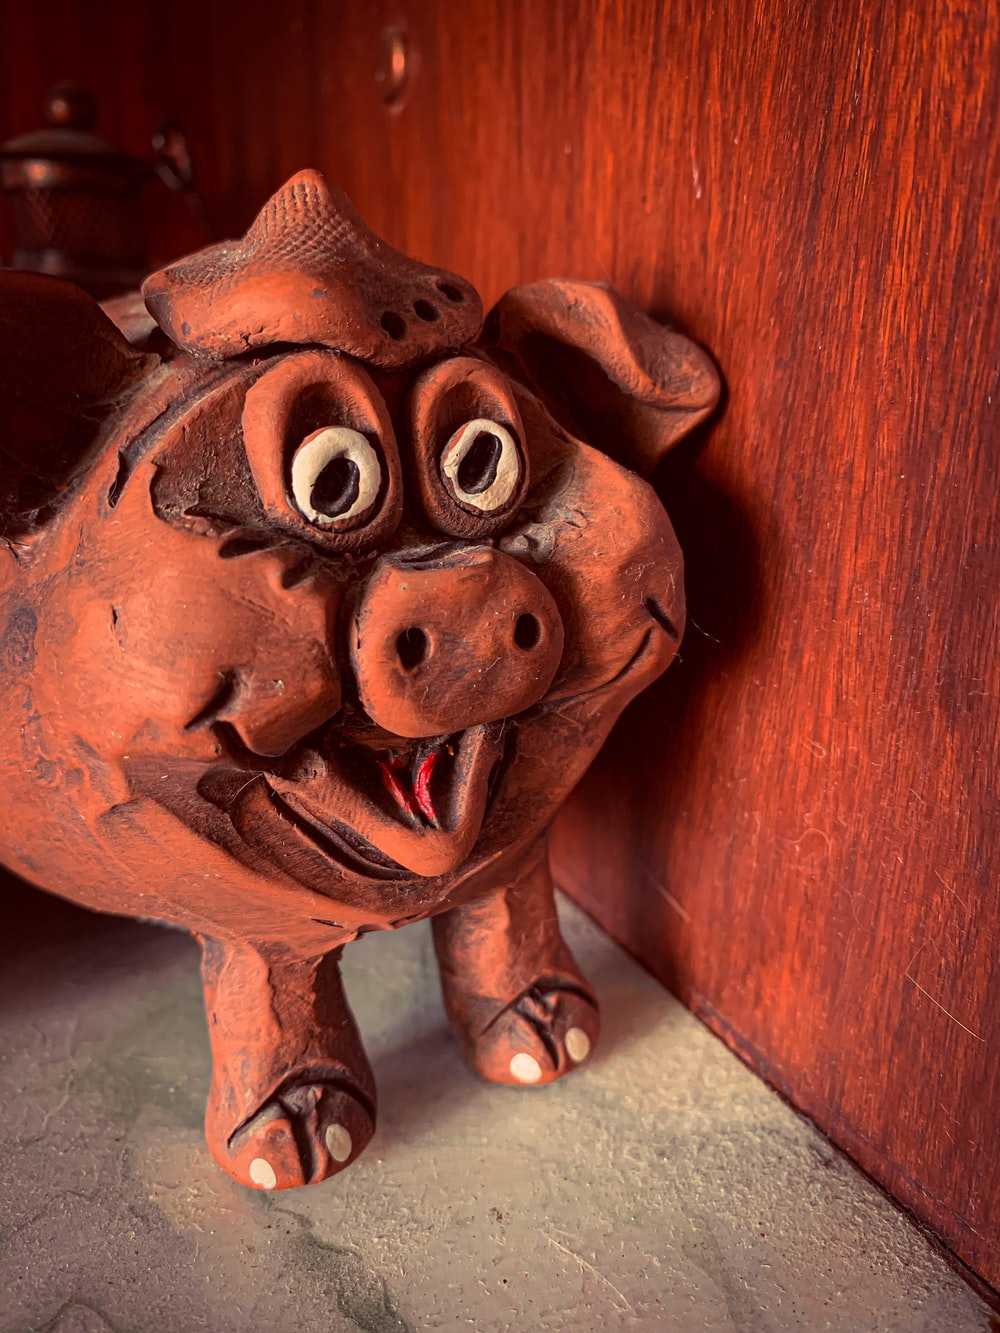 red and black ceramic pig figurine